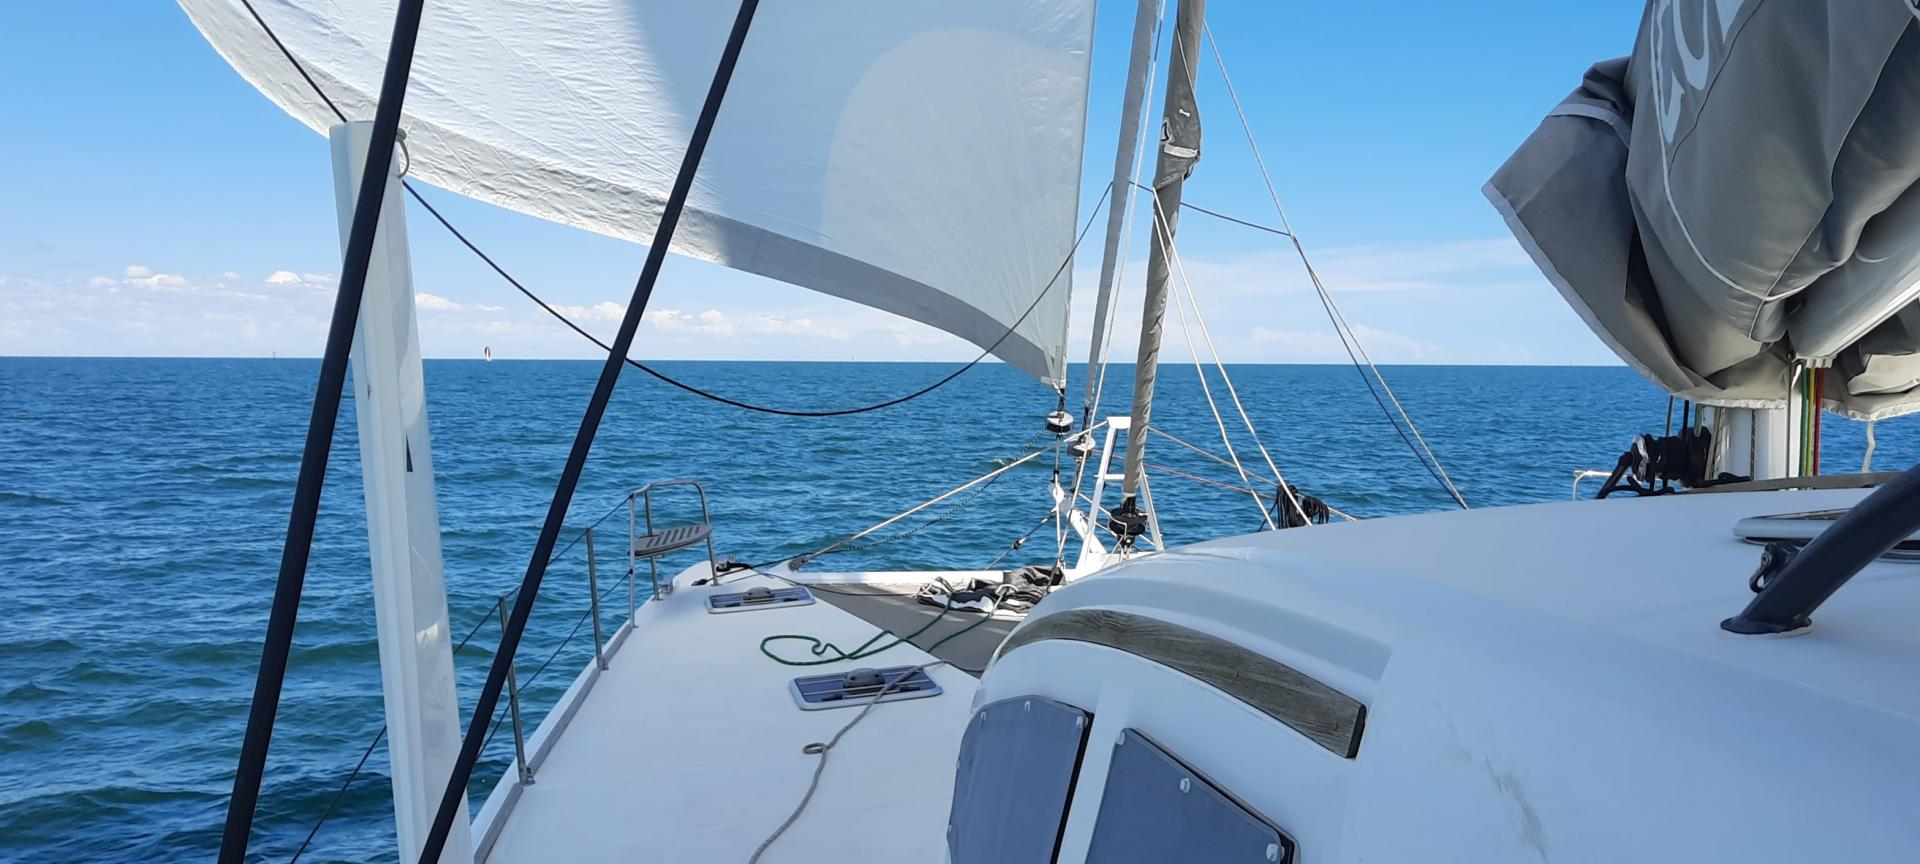 Catana 55 under sails 1